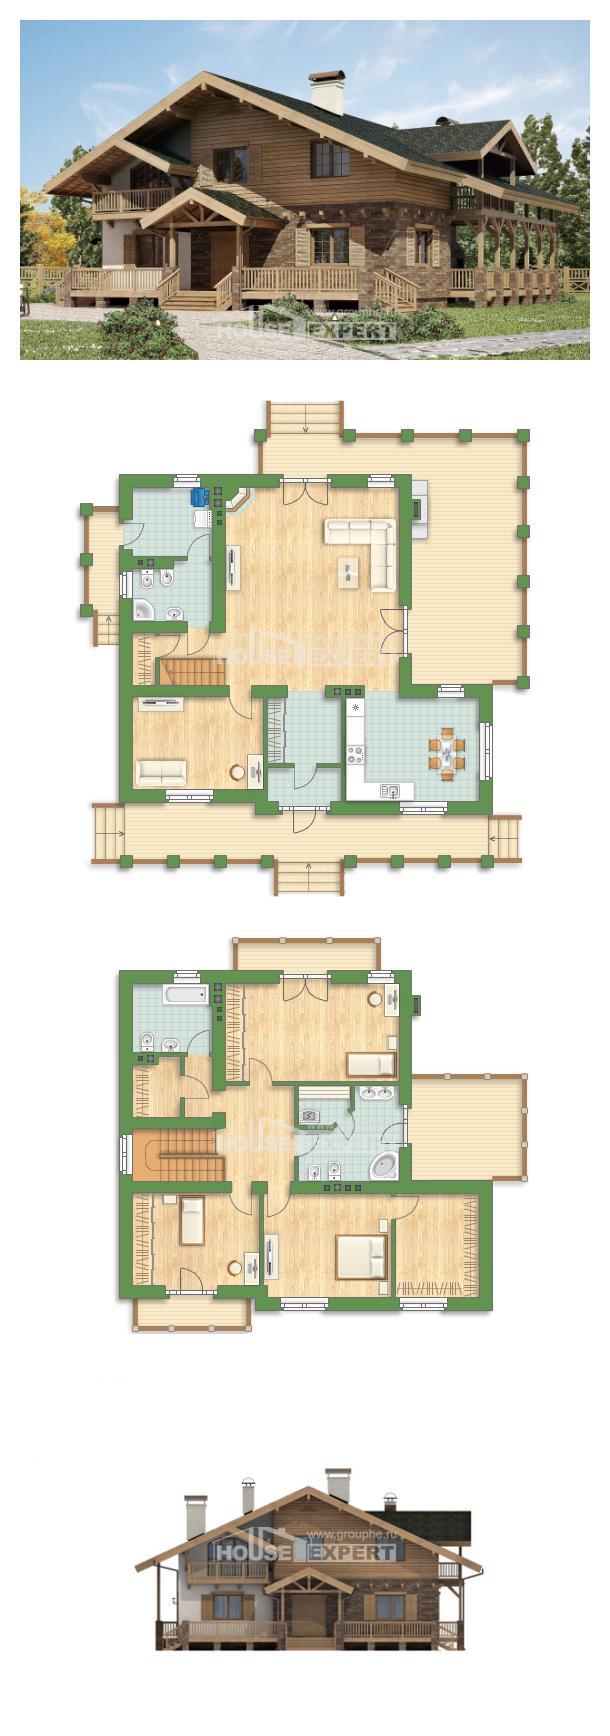 Проект дома 250-003-Л | House Expert